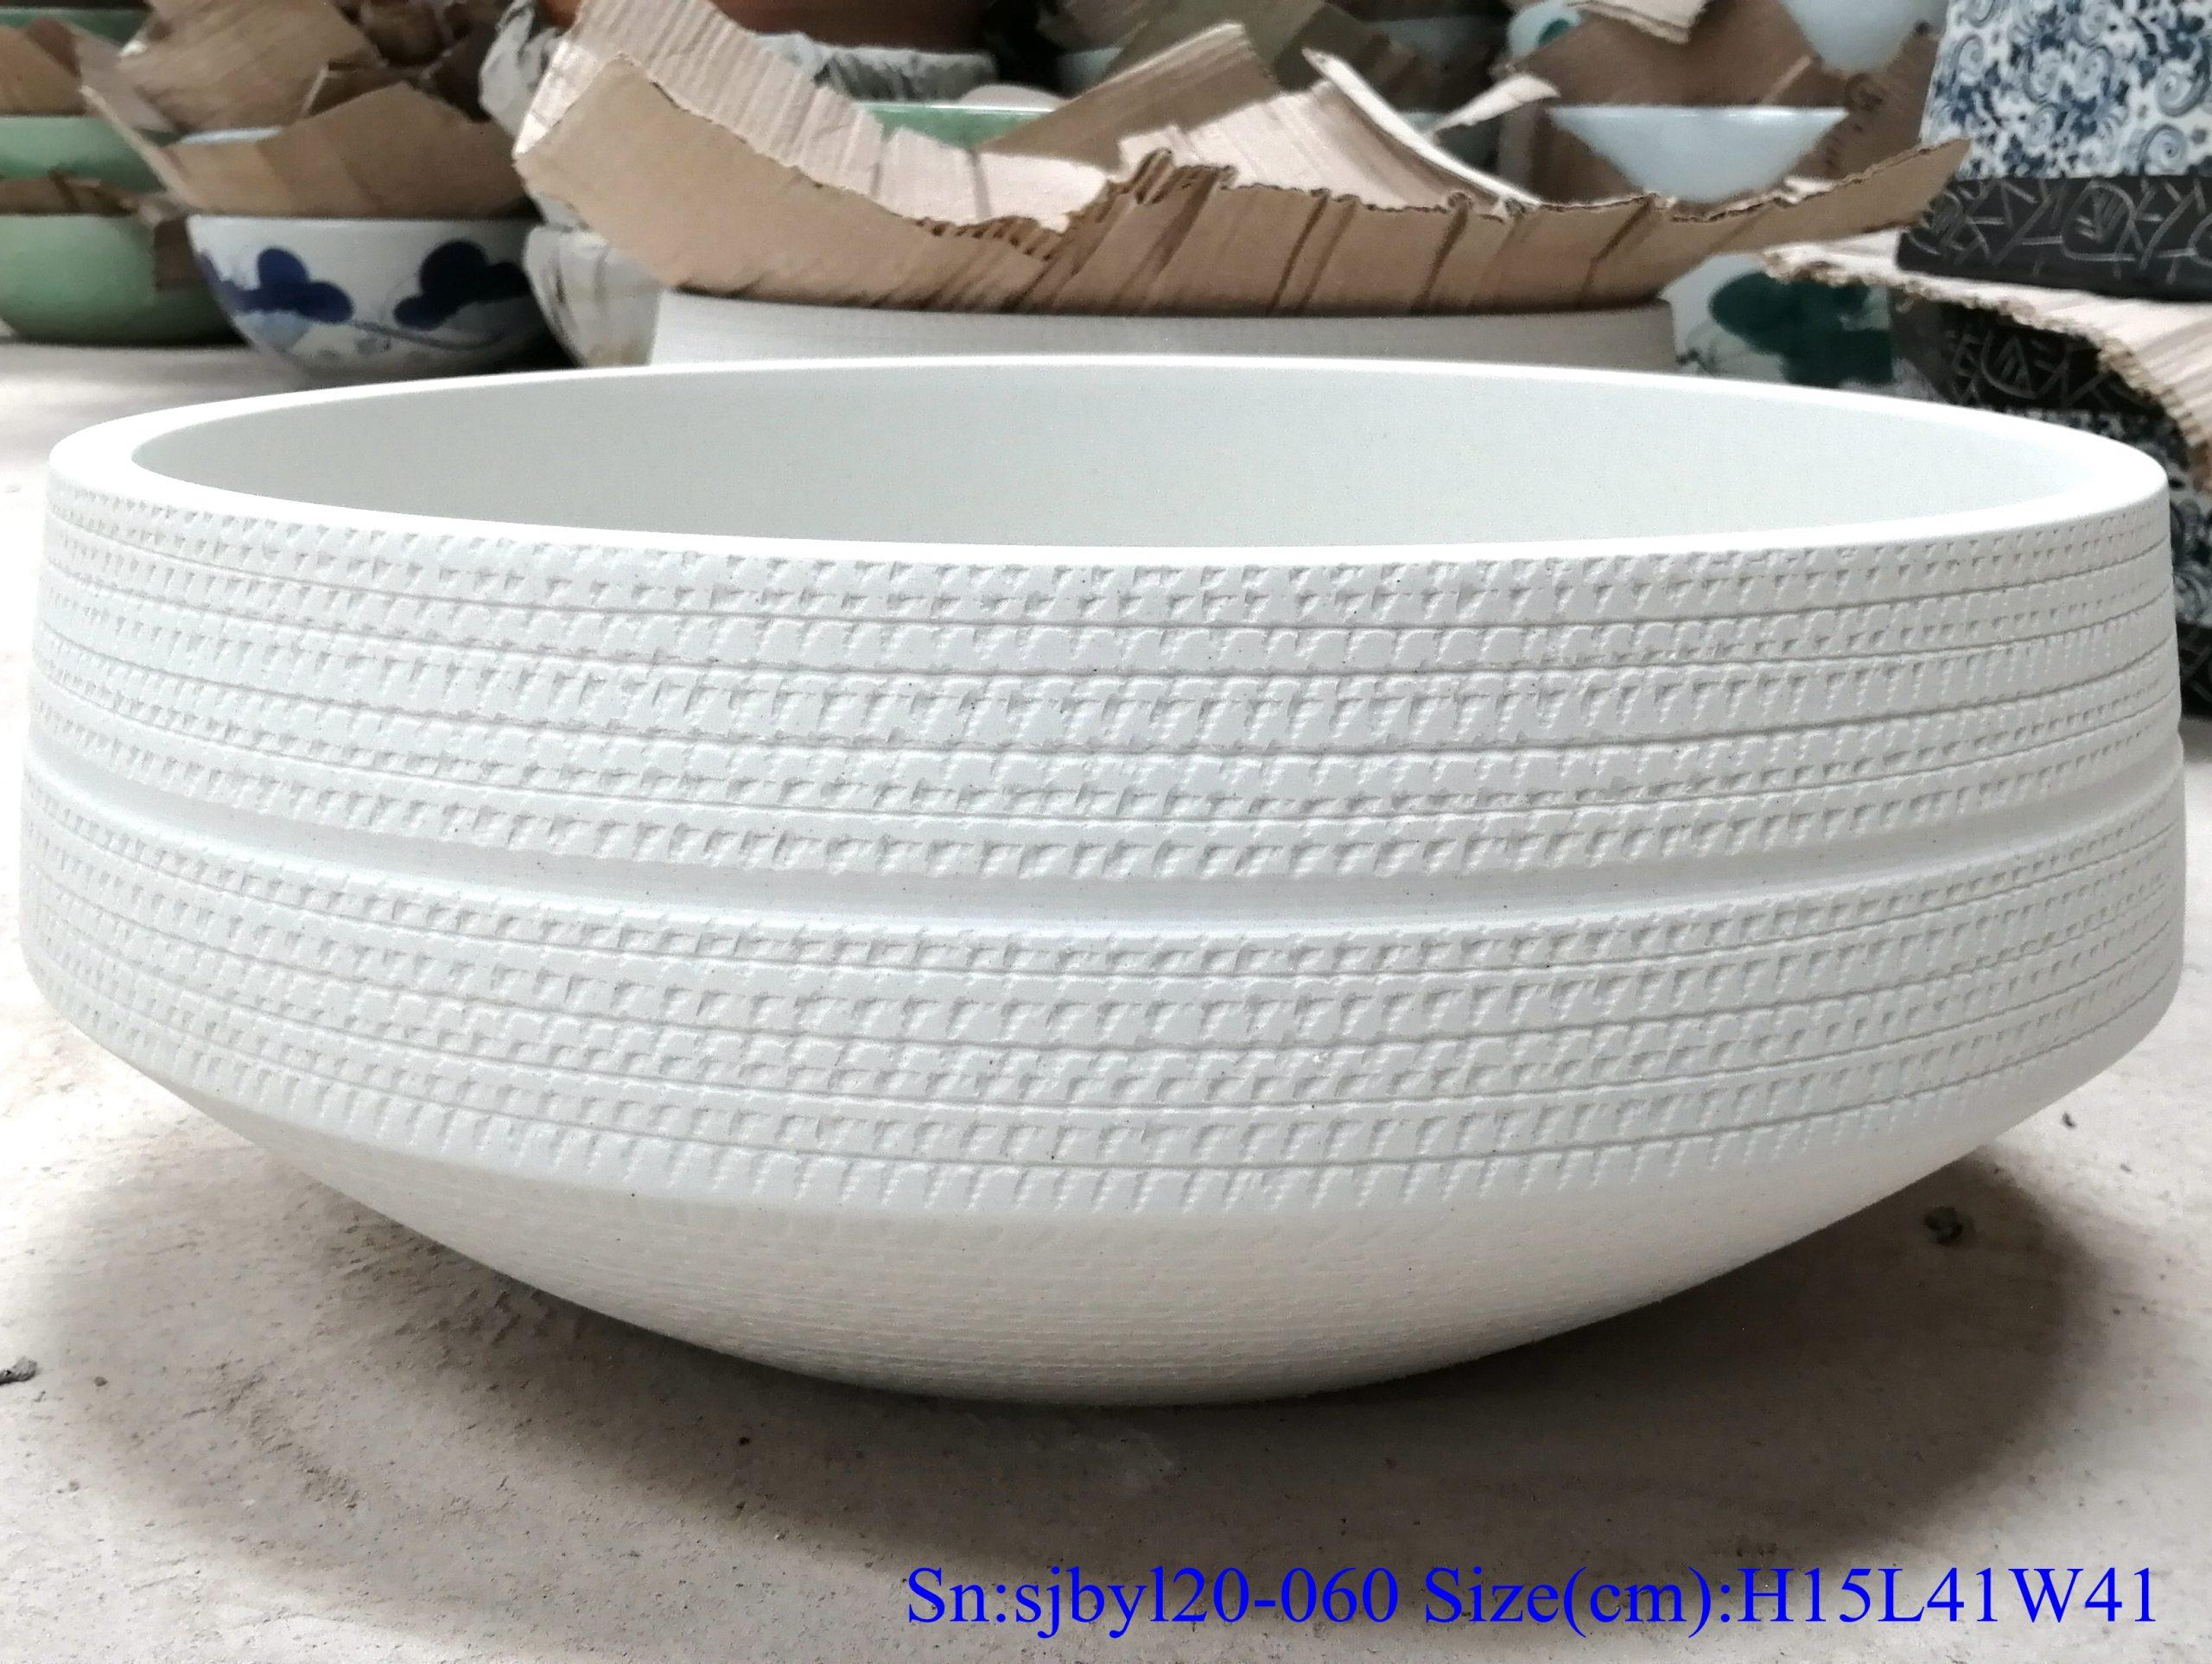 sjbyl120-060 Simply fashionable white glazed Matte procelain wash basin